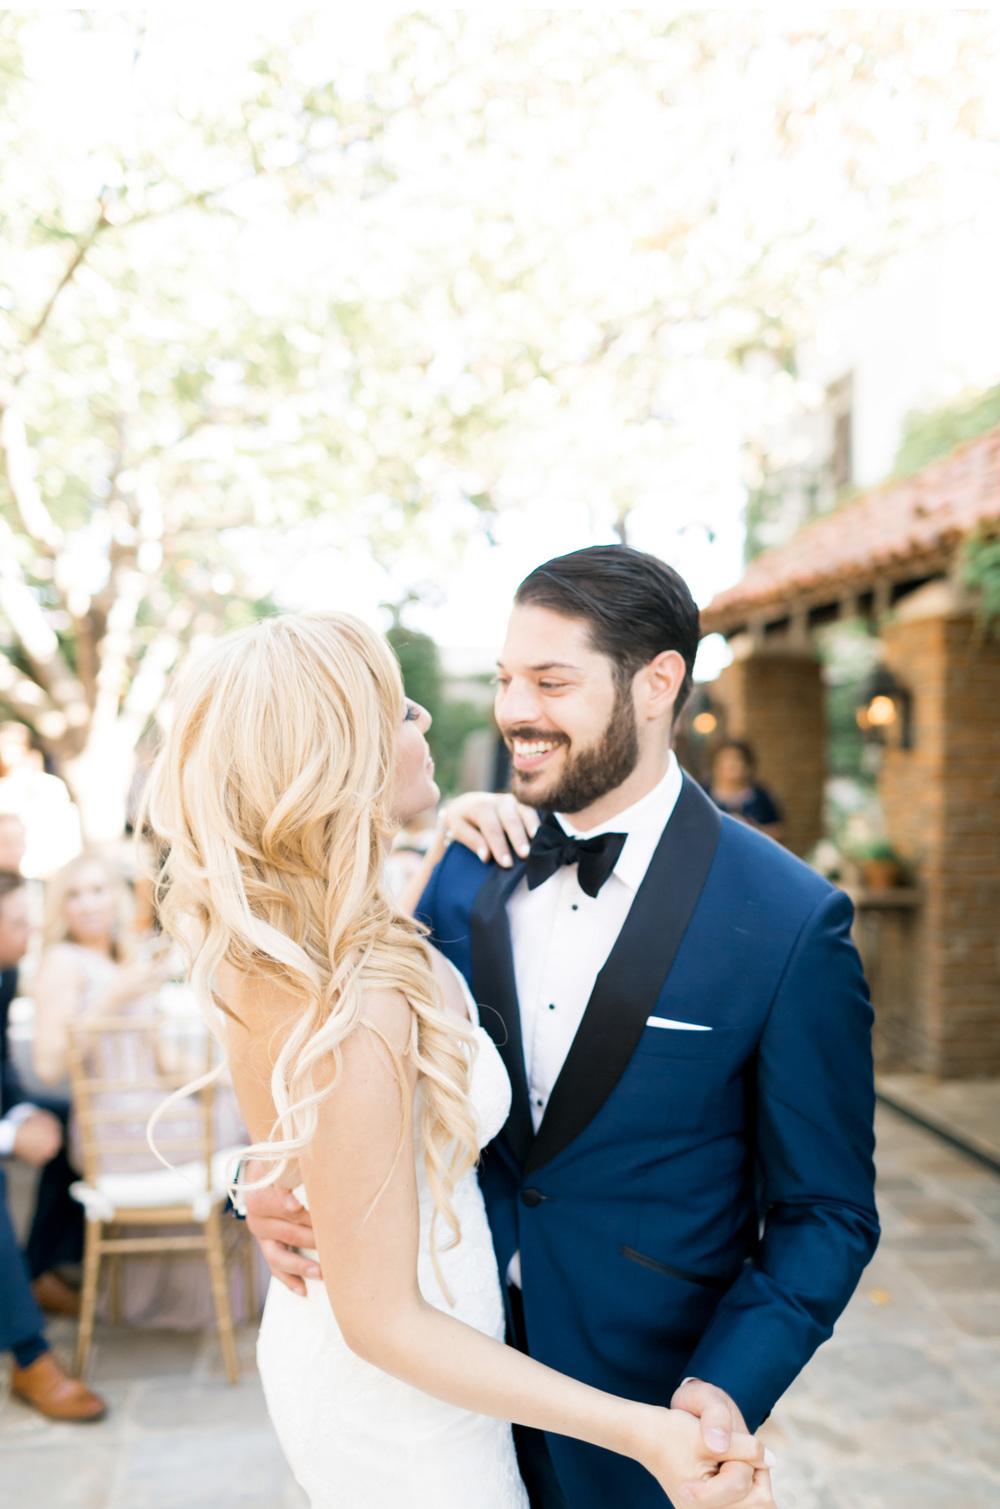 San-Luis-Obispo-Wedding-Photographer-Natalie-Schutt-Photography-Carats-and-Cake_01.jpg